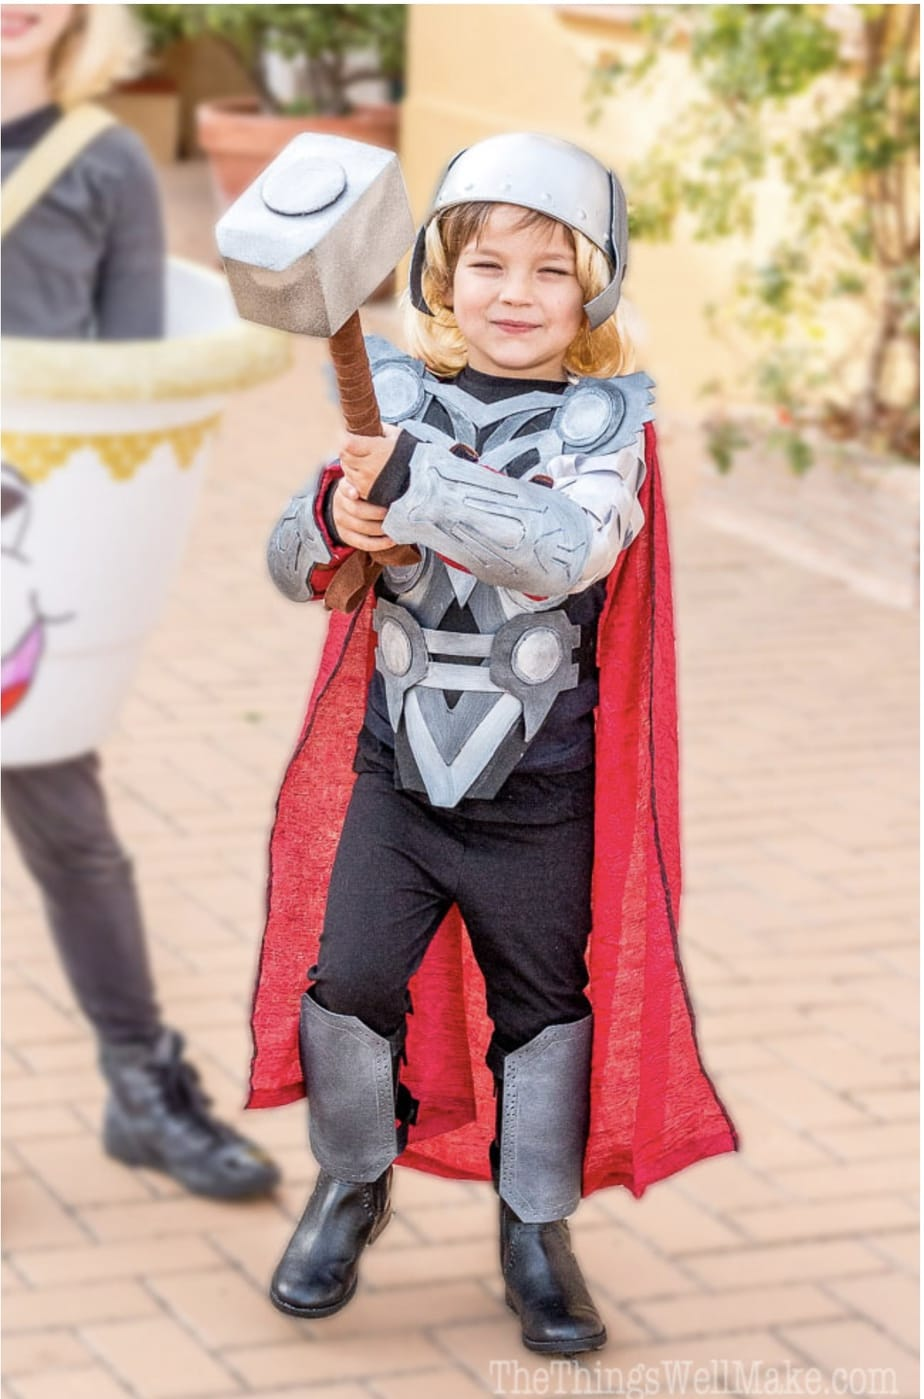 DIY Superhero Costumes - Cutesy Crafts